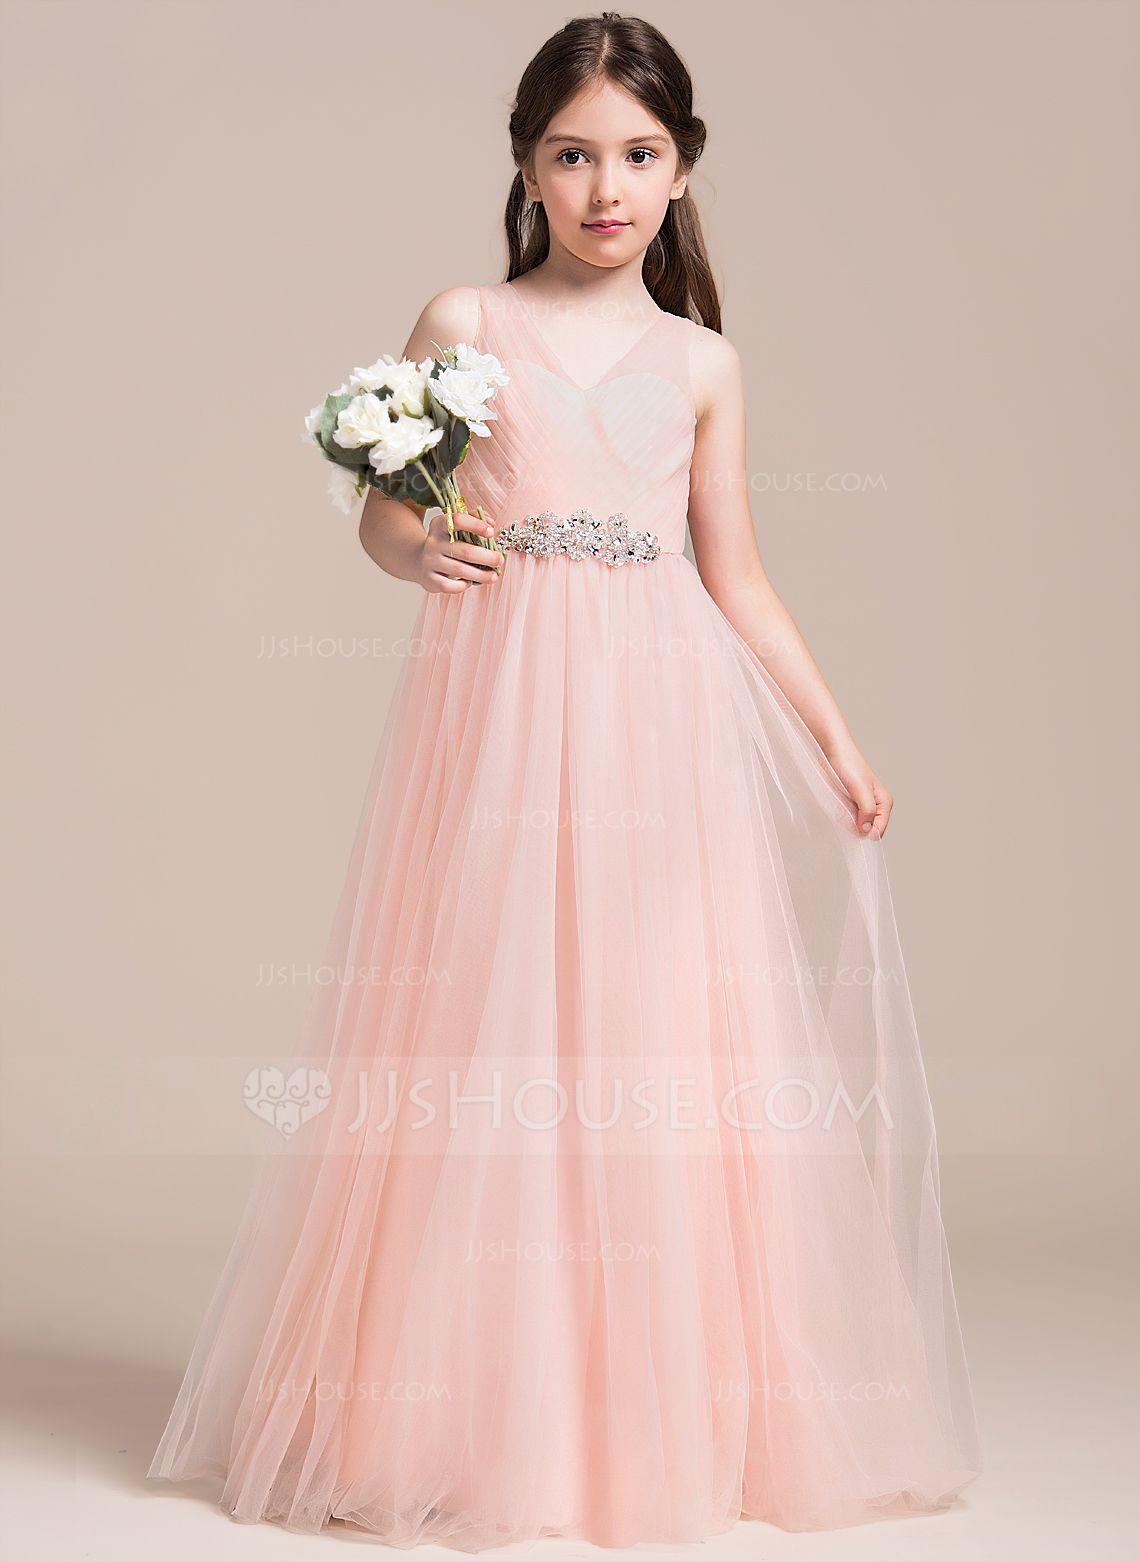 Dress for wedding party for girl  ALinePrincess Vneck FloorLength Tulle Junior Bridesmaid Dress